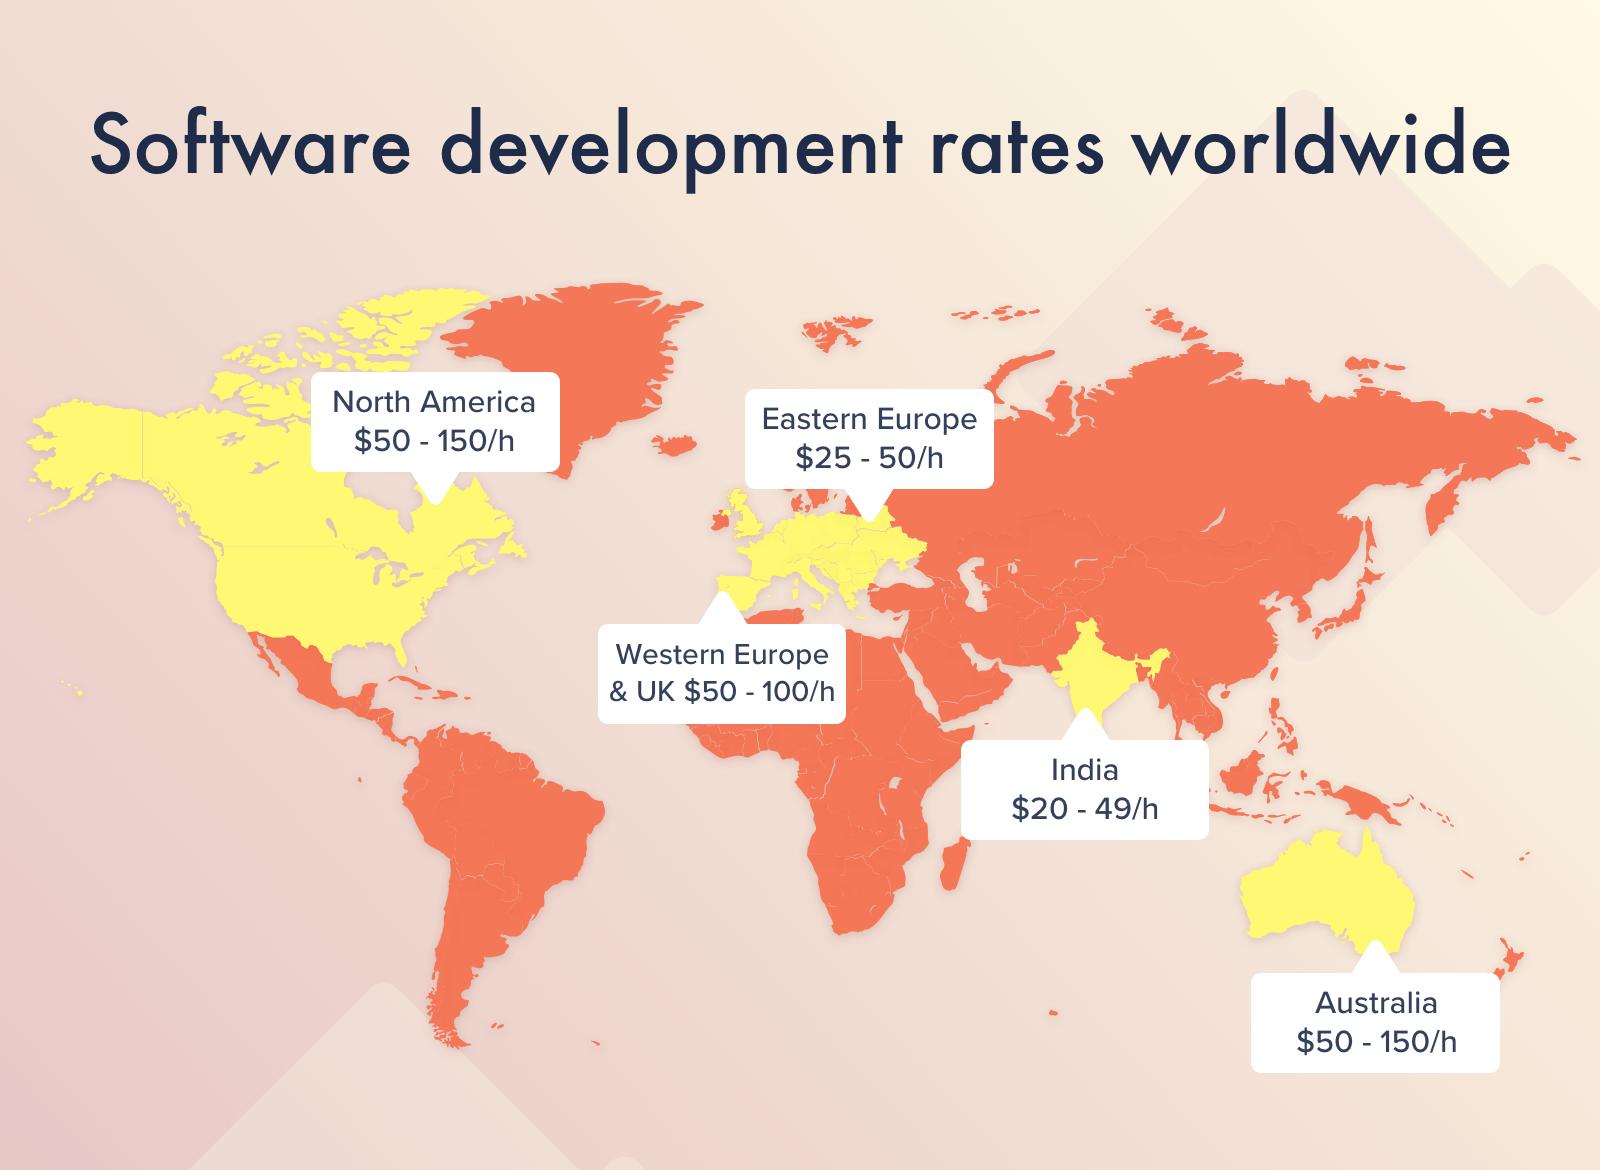 Software development rates worldwide